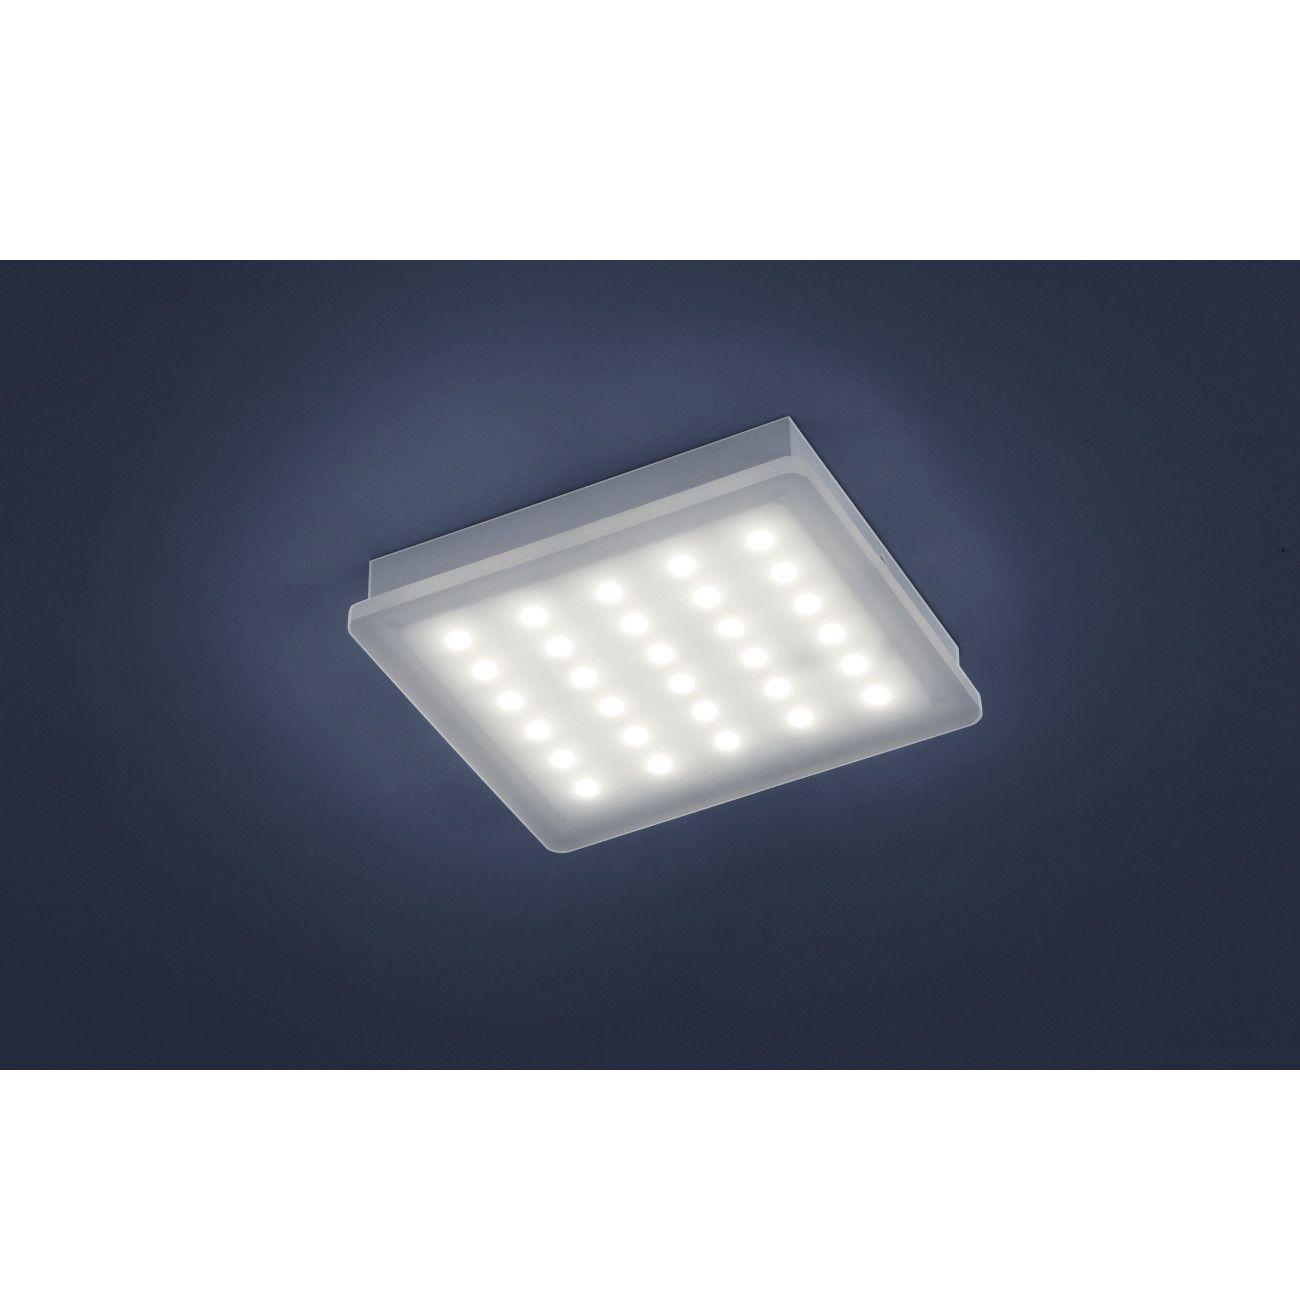 deckenlampe quadratisch led groß pic oder fadbdaaebbccfadeaddd